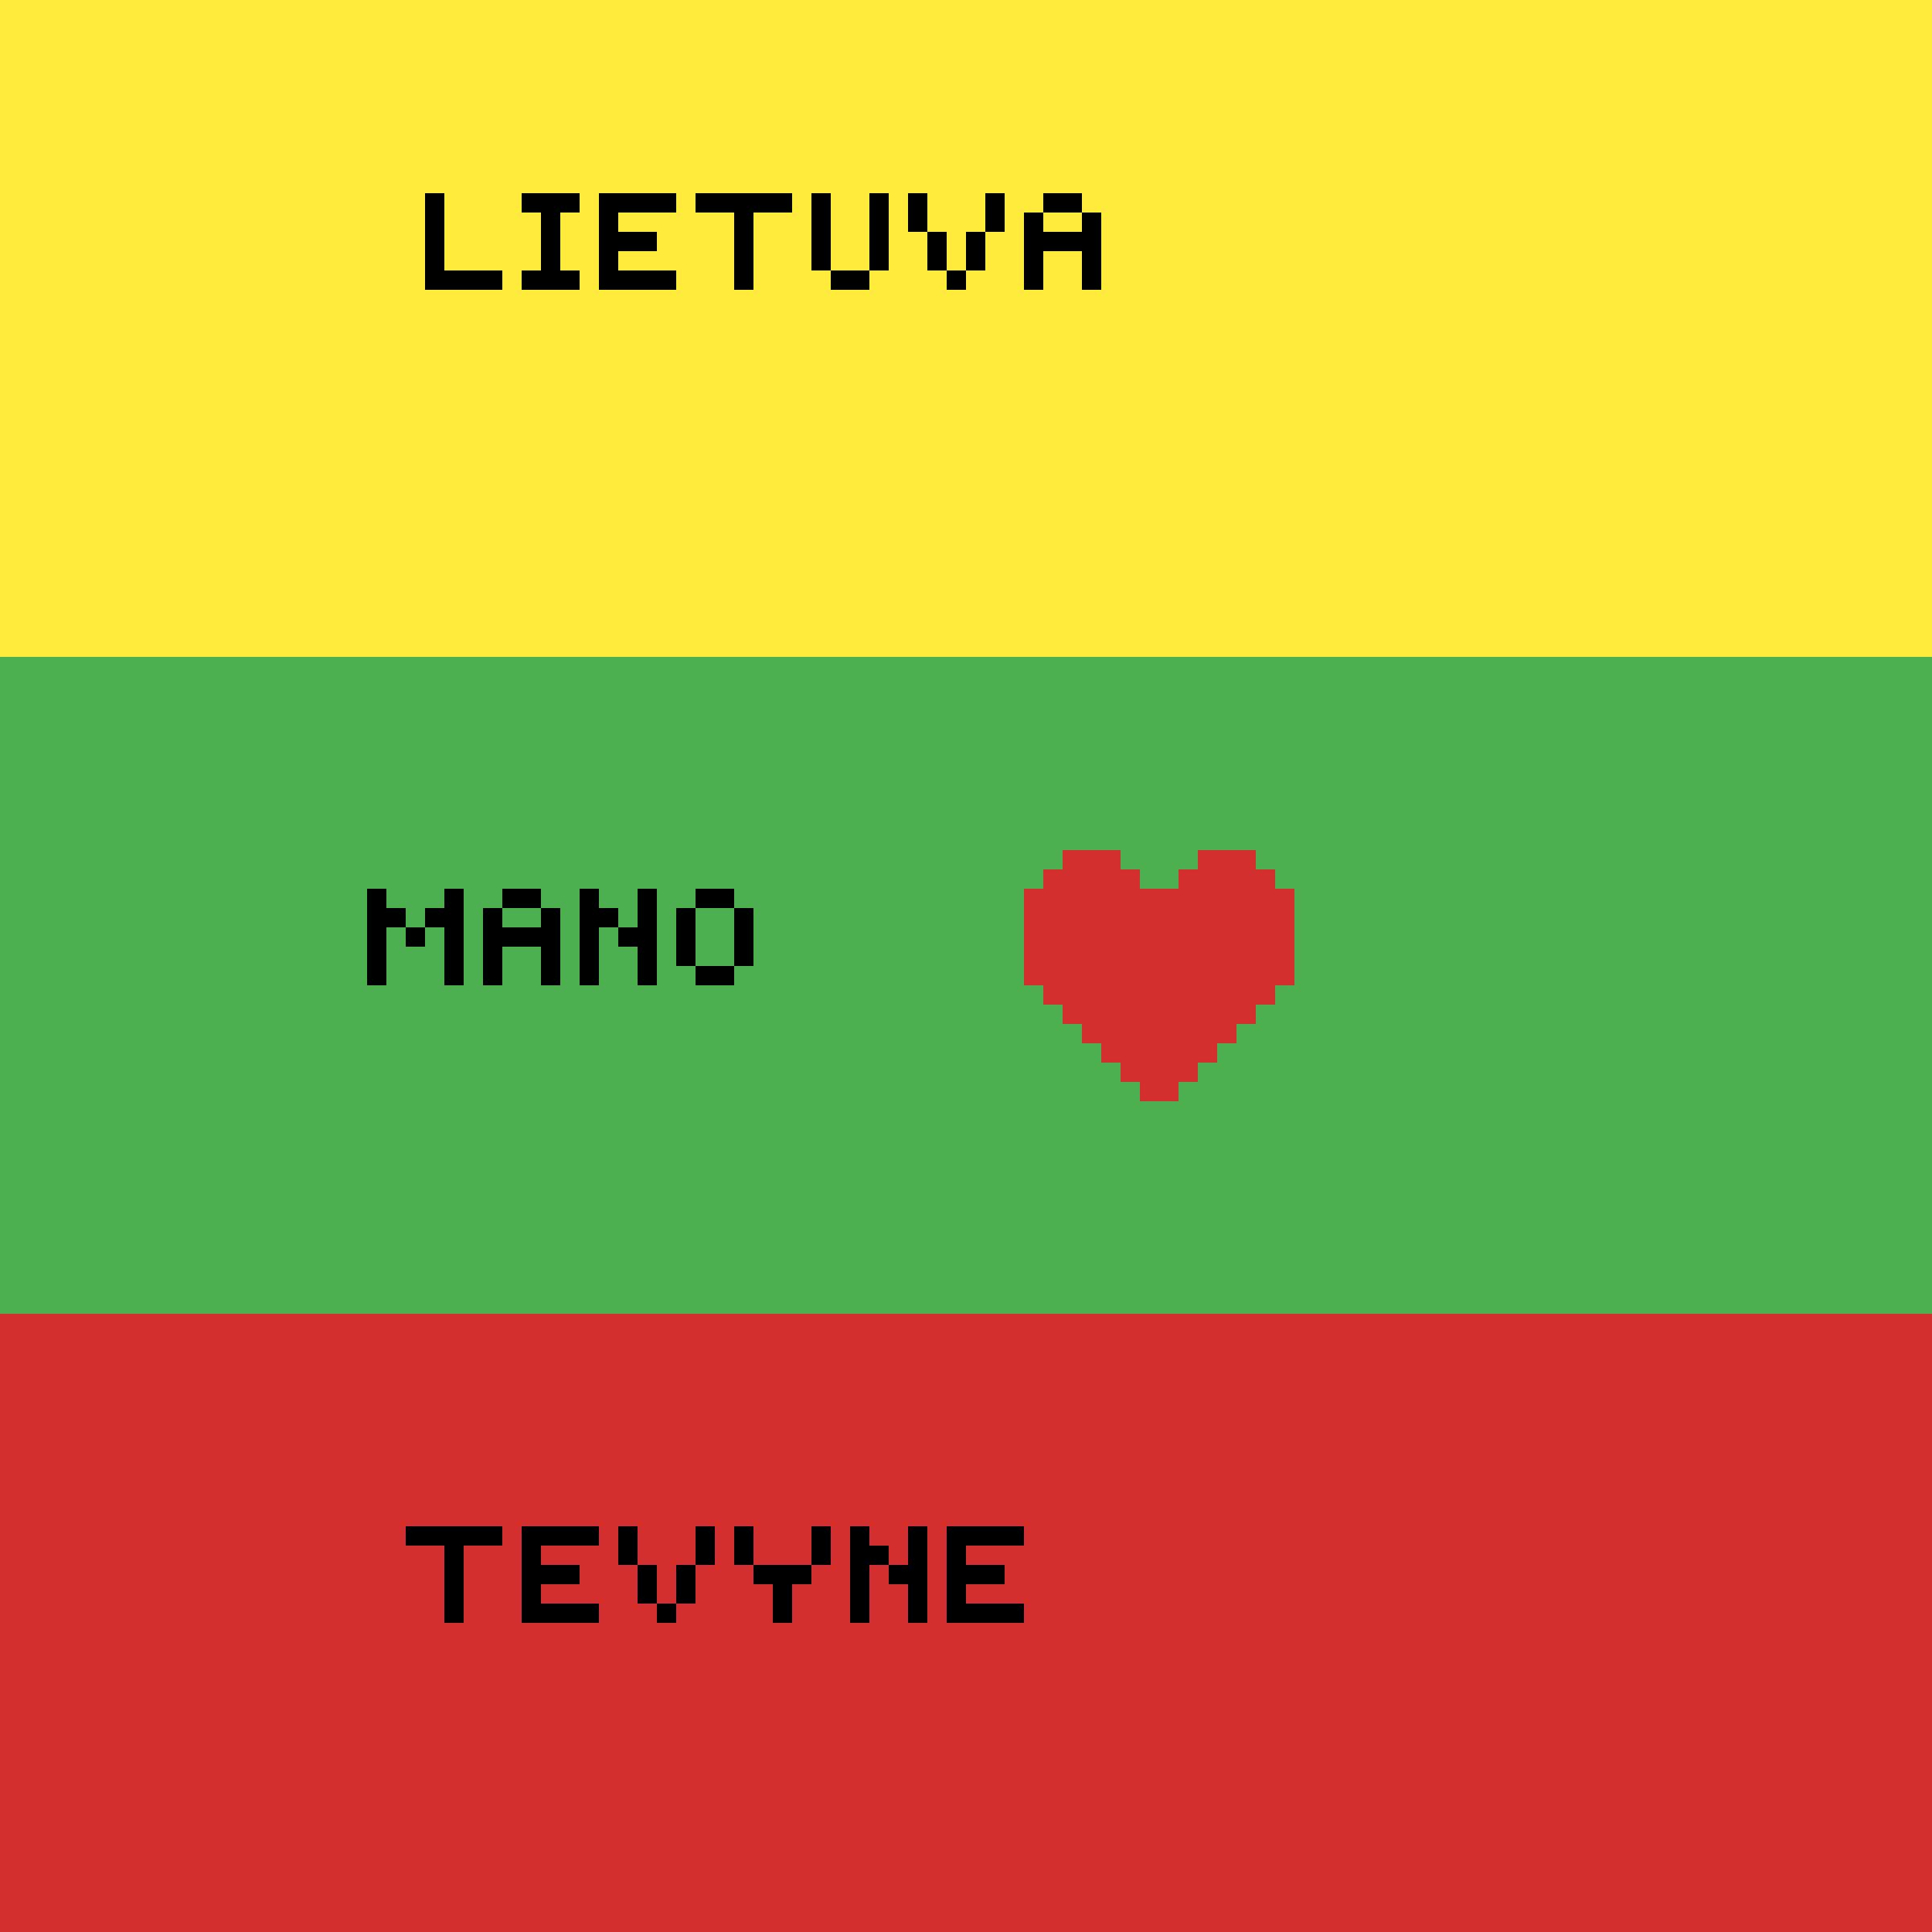 pixil-frame-0-3-deivido